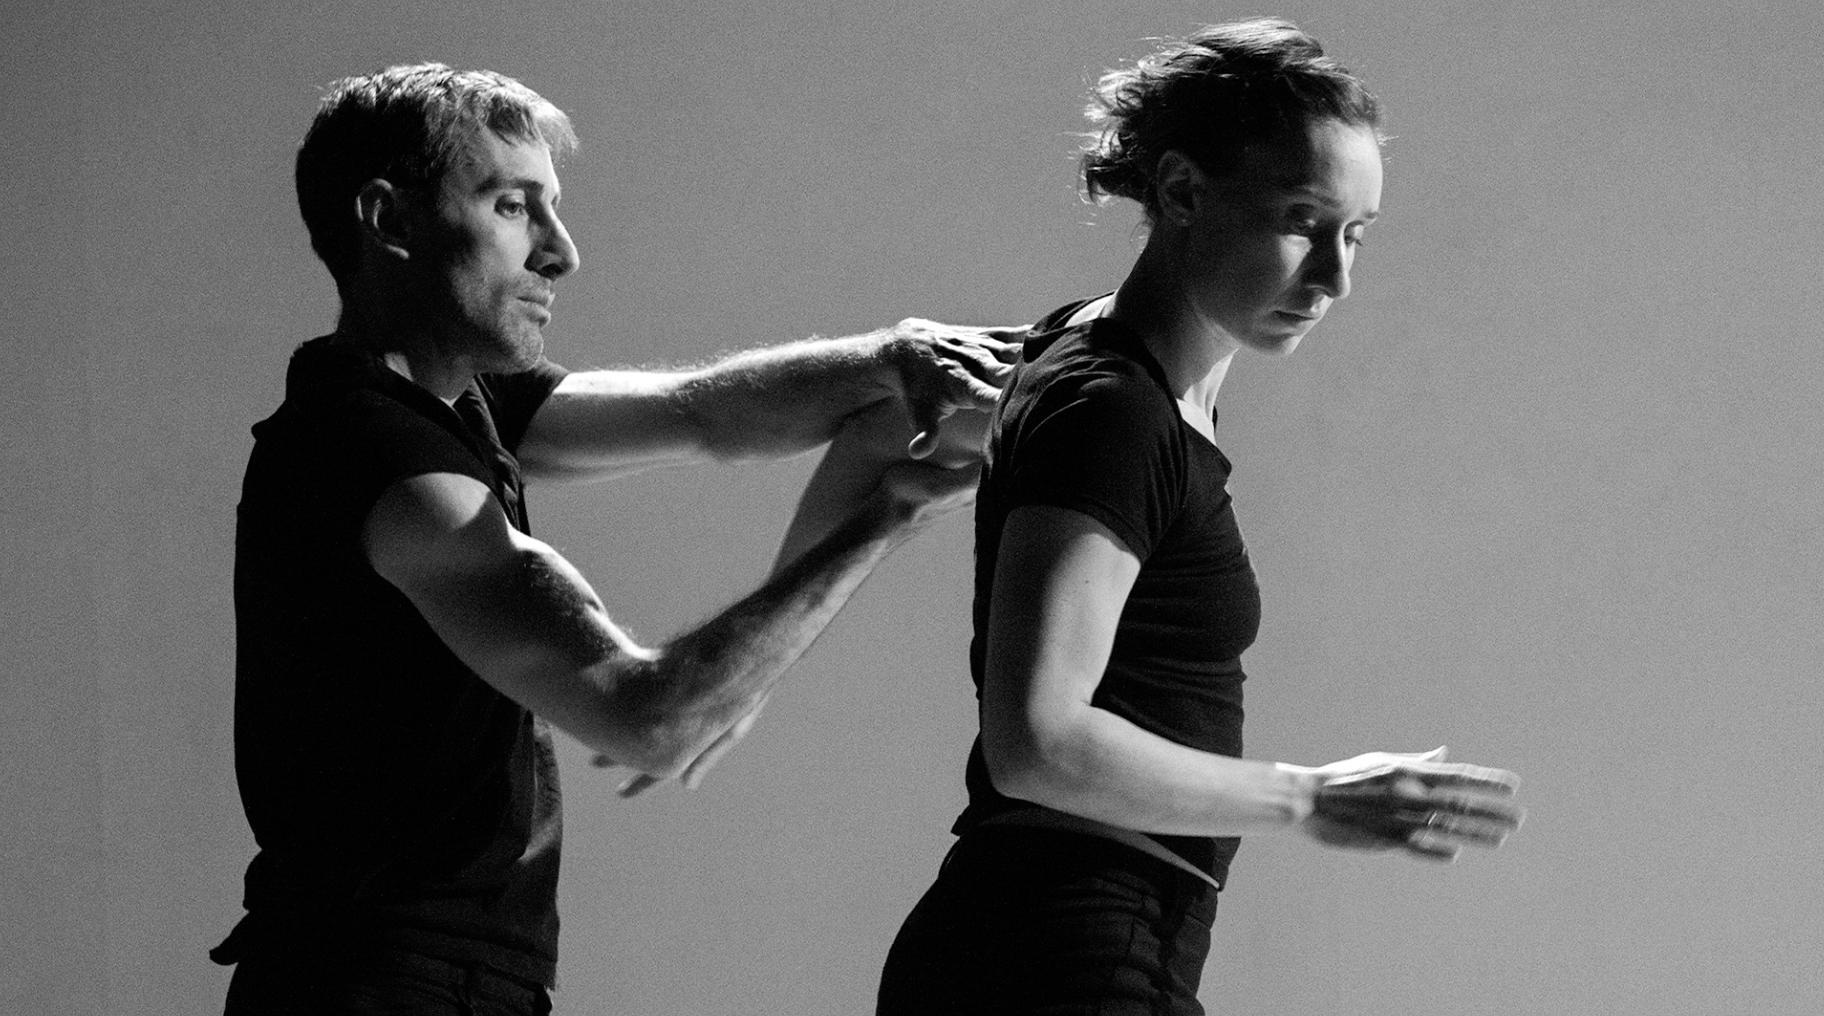 Engage the Feeling Arms  by Peter Bingham  Performers: Olivia Shaffer, Farley Johansson, Walter Kubanek at EDAM Choreographic Series Dec 2016 image credit: Chris Randle